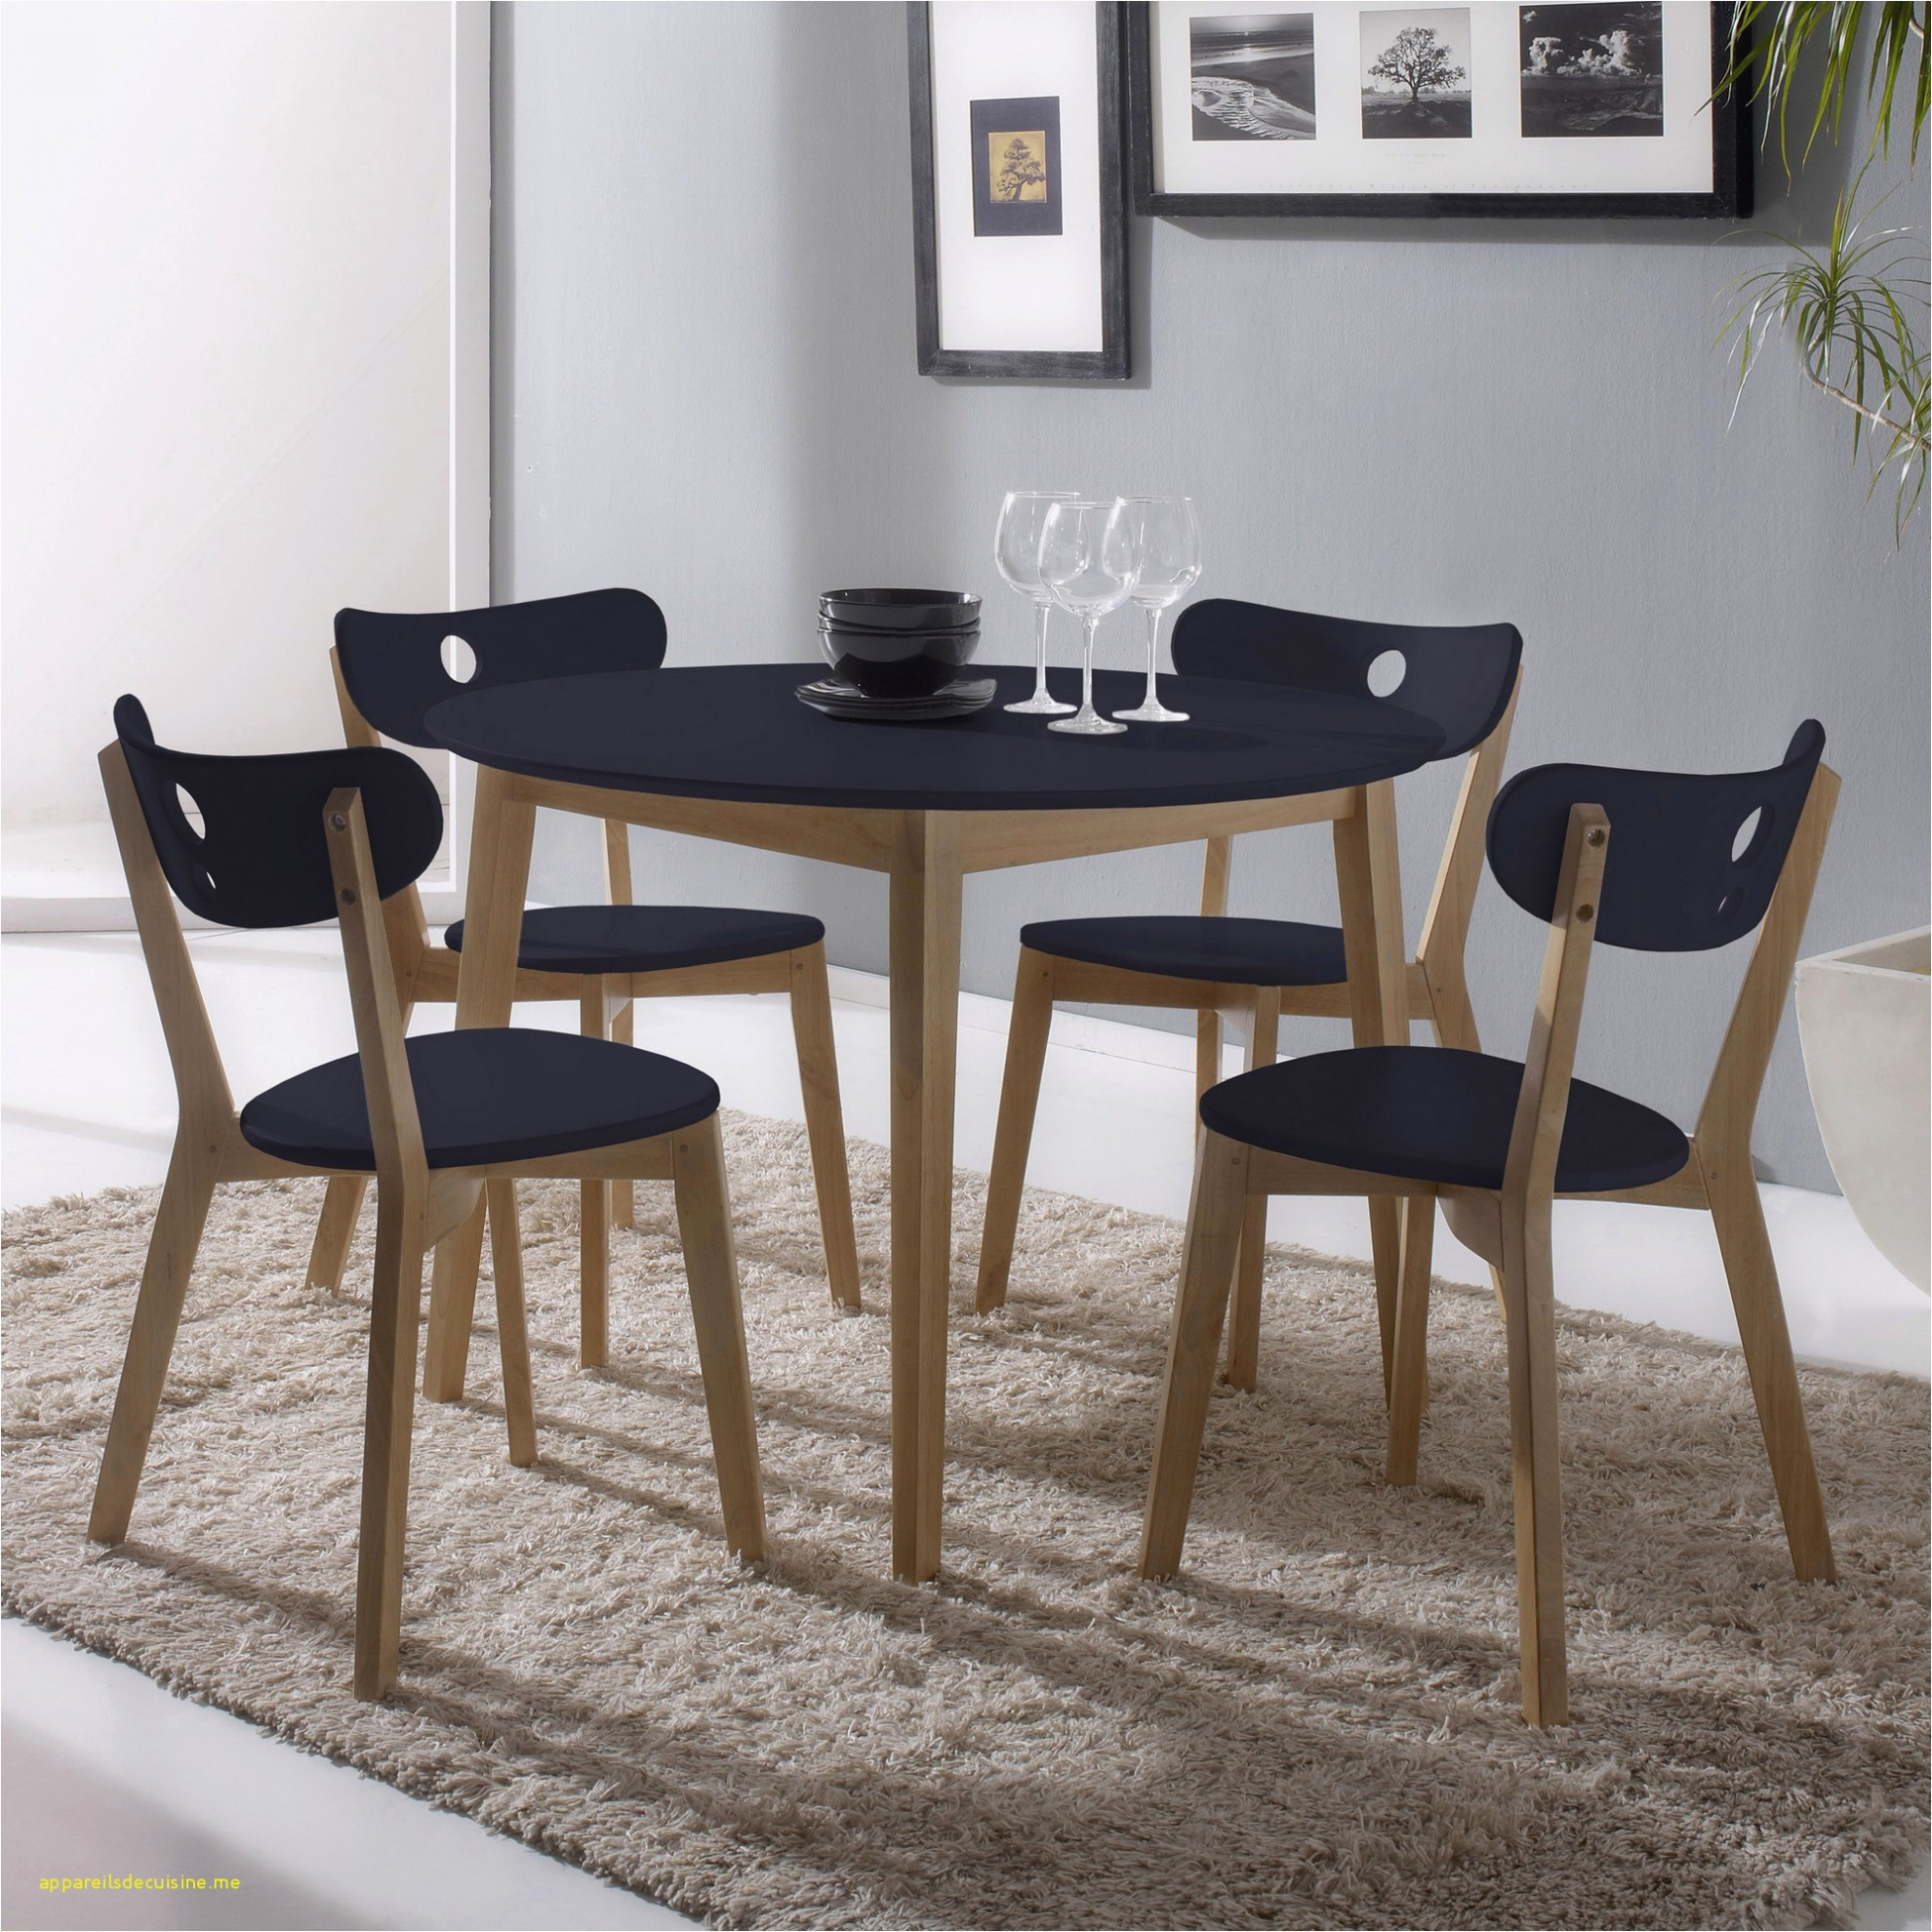 transformer un meuble en bois en meuble industriel frais chaise en fer best relooker chaise en paille elegant chaise of transformer un meuble en bois en meuble industriel